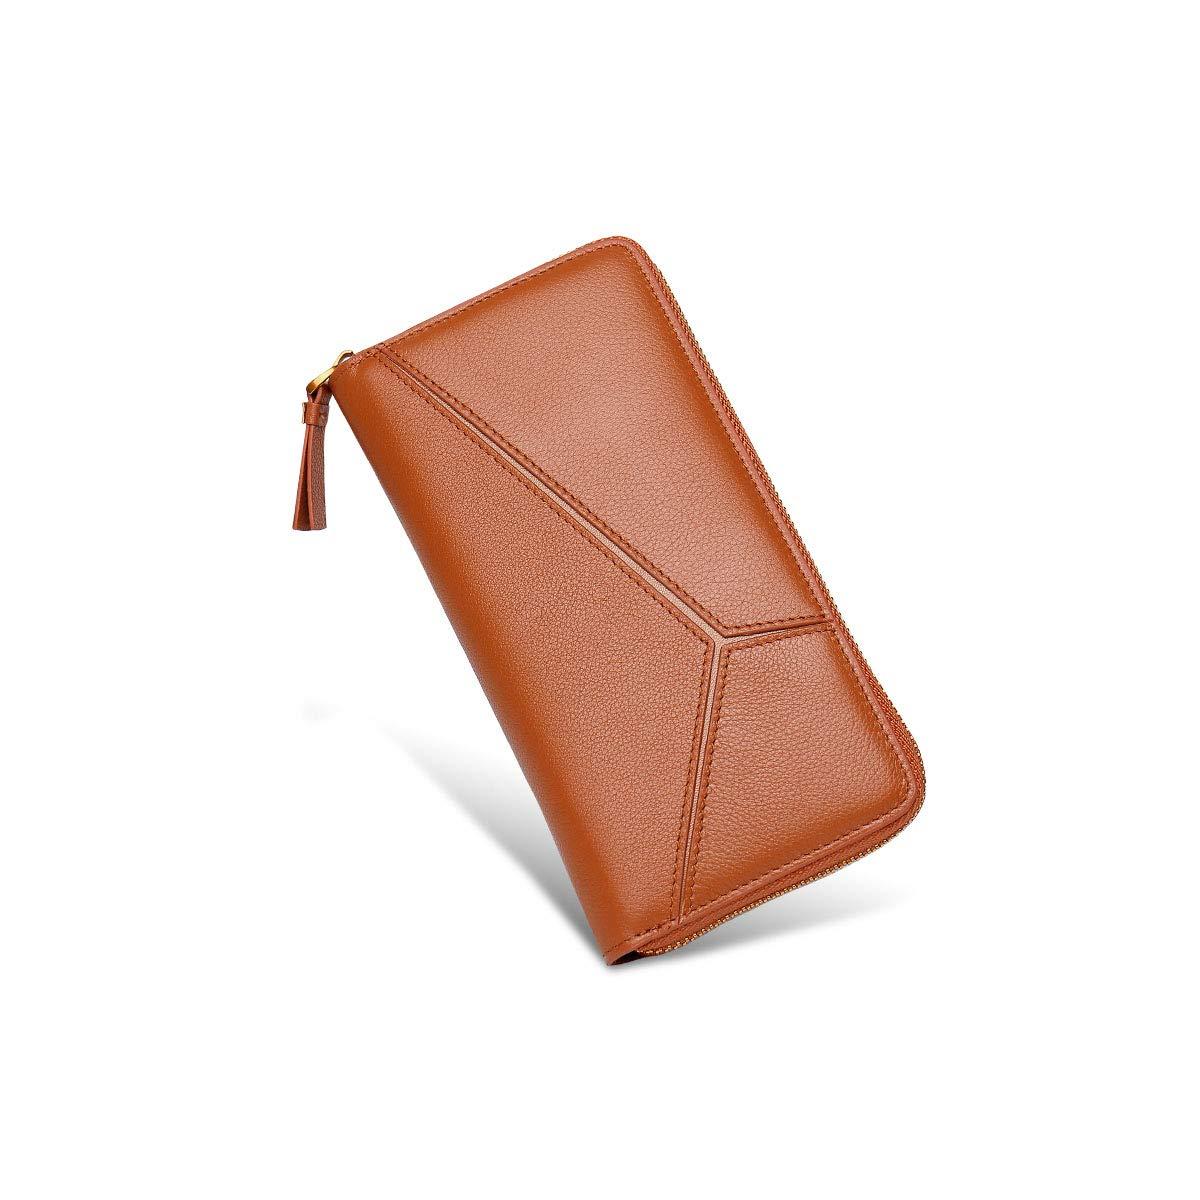 orange Leather Zipper Wallet, Clutch, Big Travel Wallet Handbag, Ladies Boxed Gift, Card Package